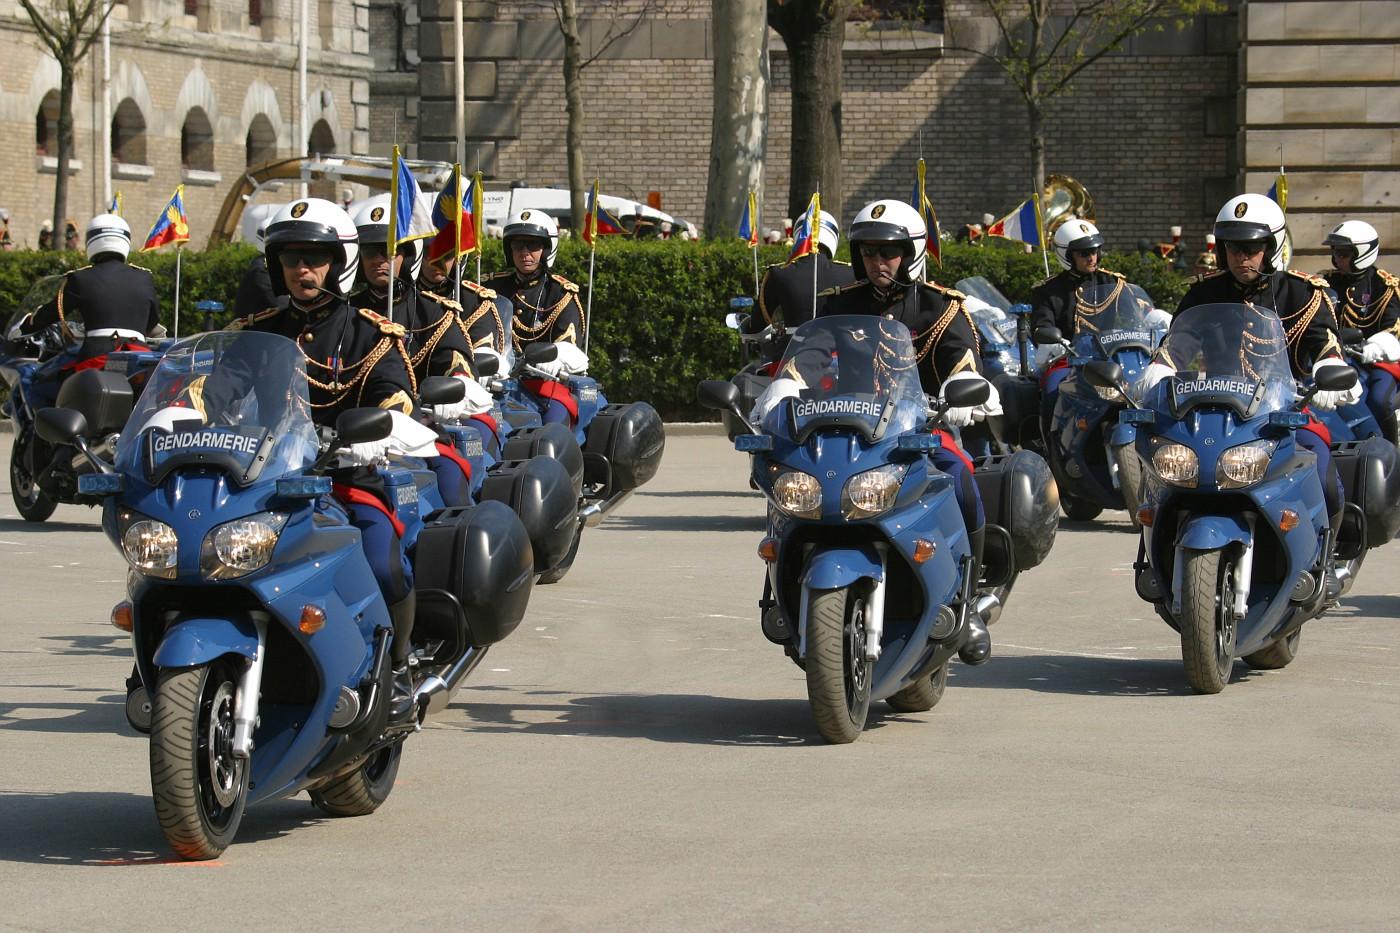 France - Garde Republicaine Motors